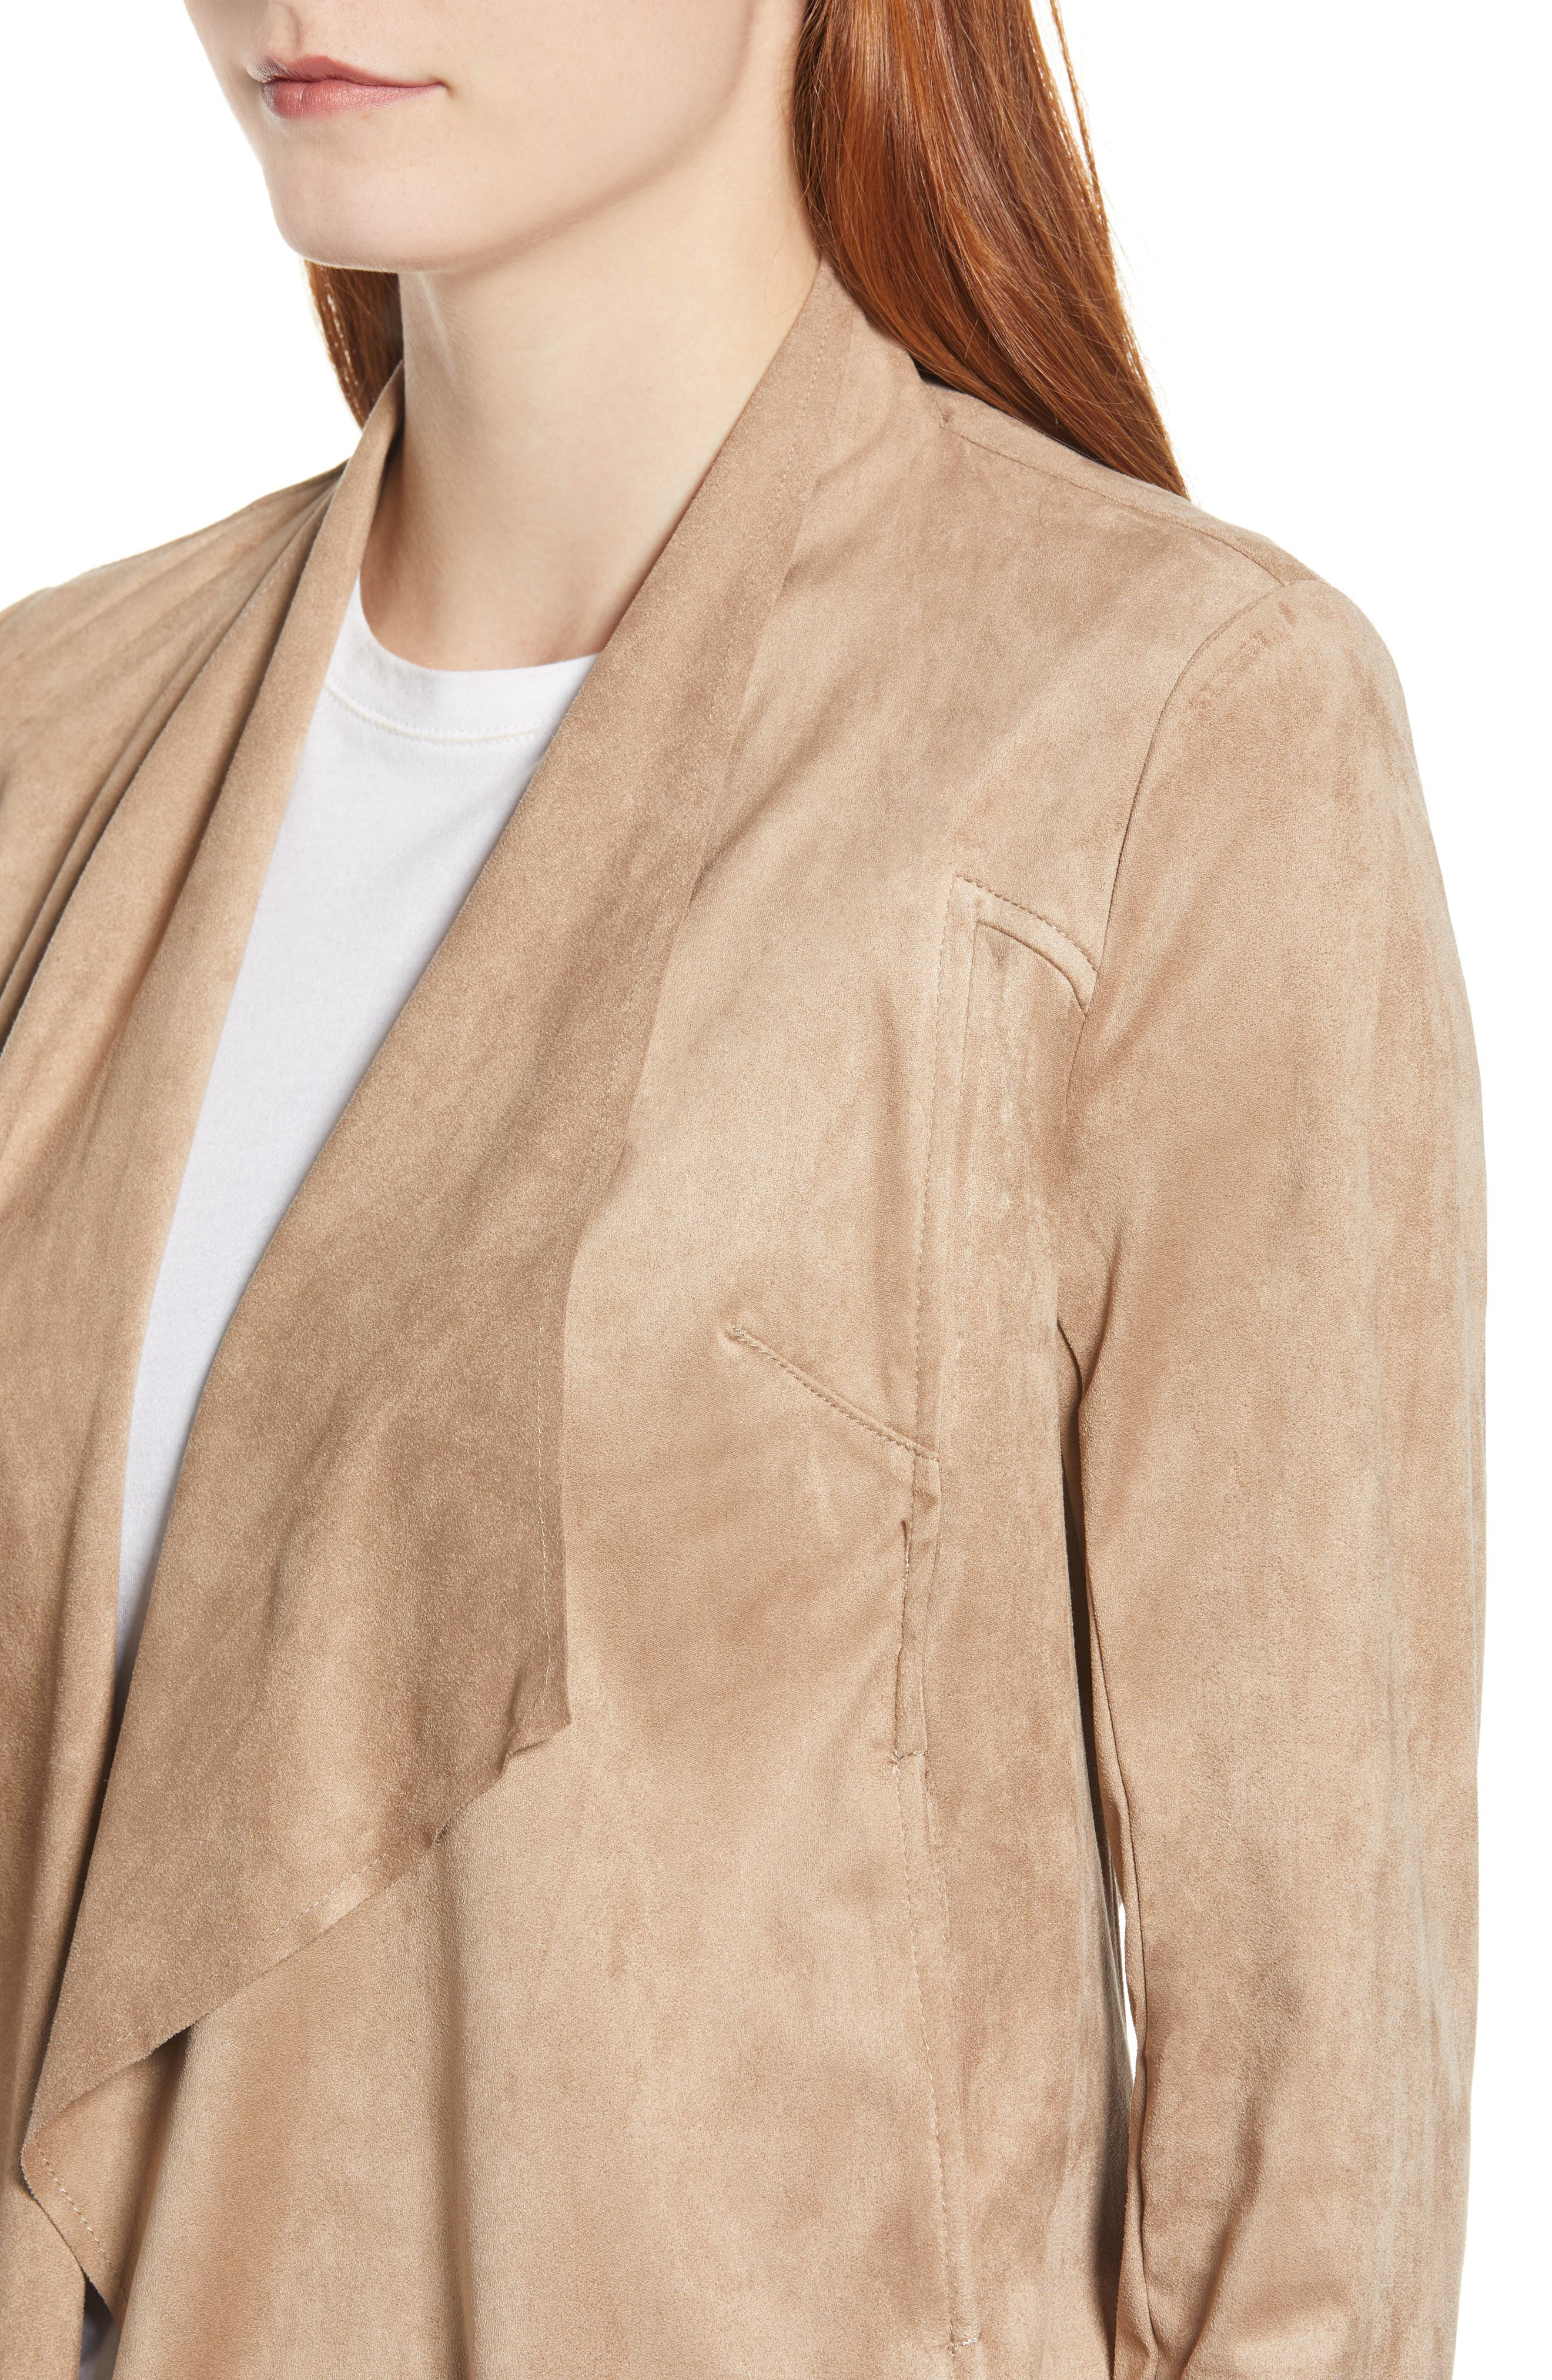 Tayanita Faux Suede Jacket,                             Alternate thumbnail 4, color,                             380